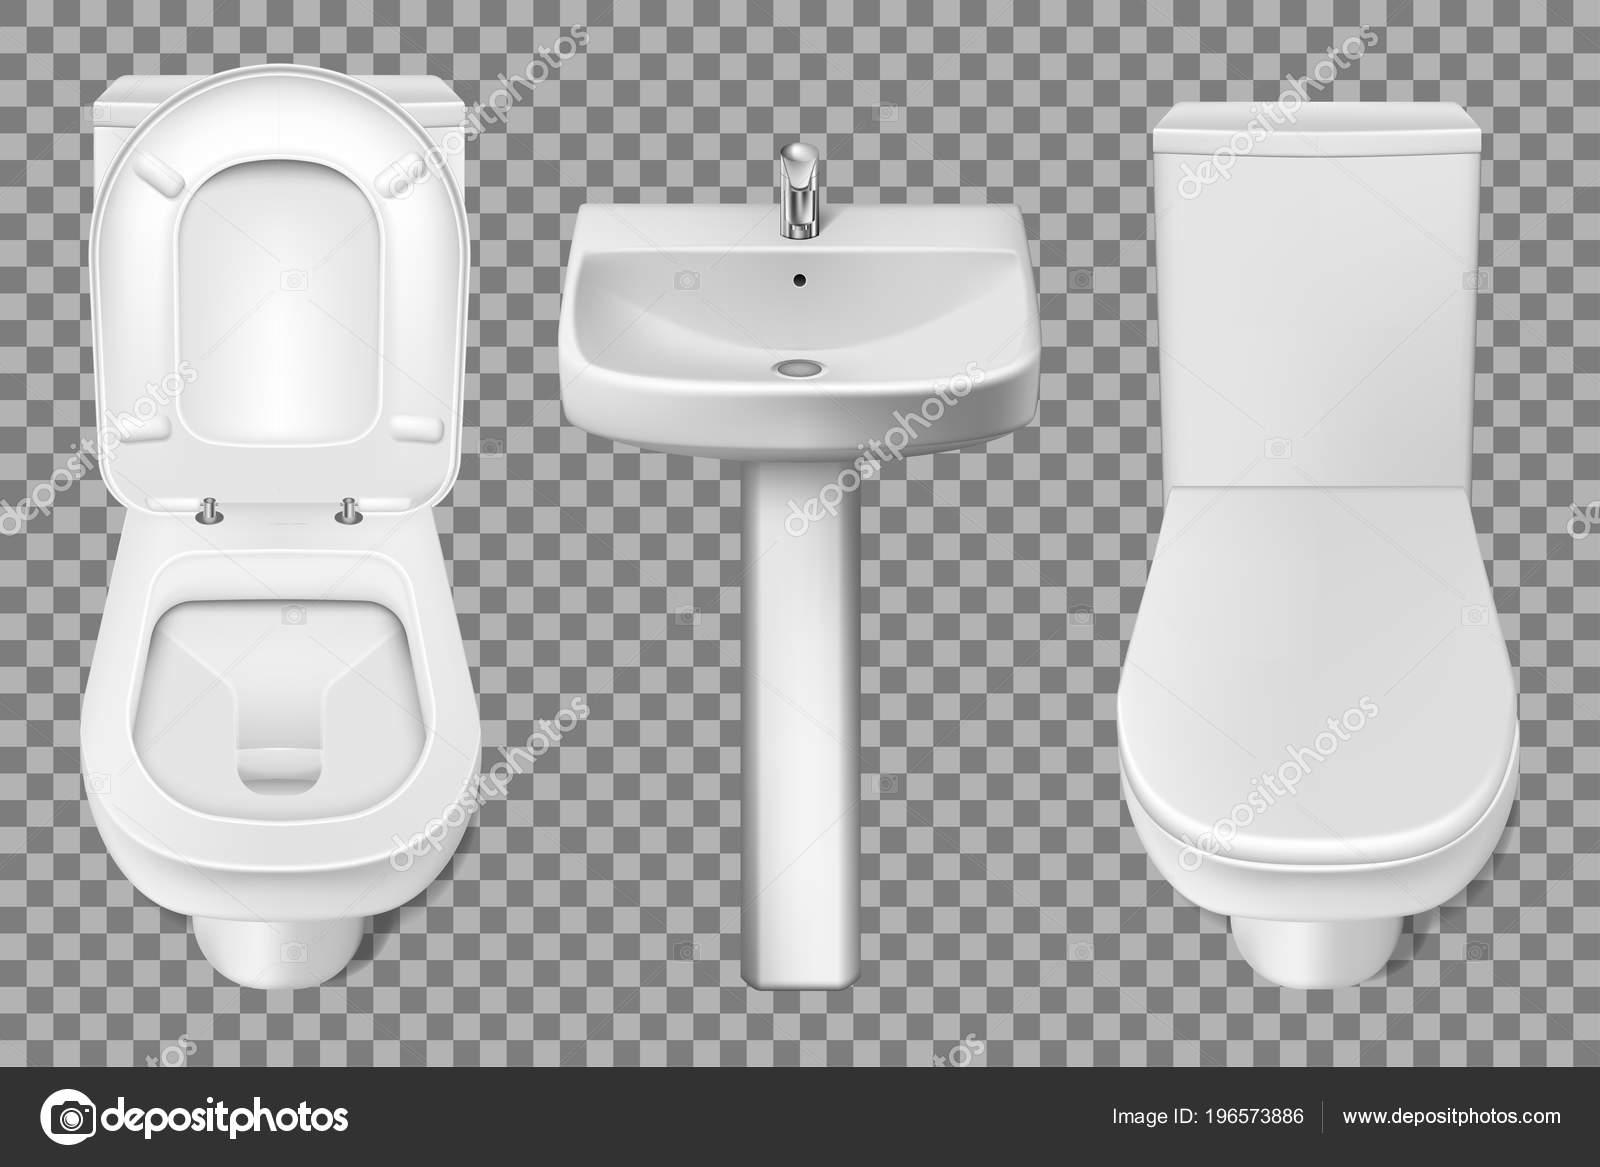 Badkamer Wasbak Kom : Badkamer interieur toilet en wastafel realistische mockup close